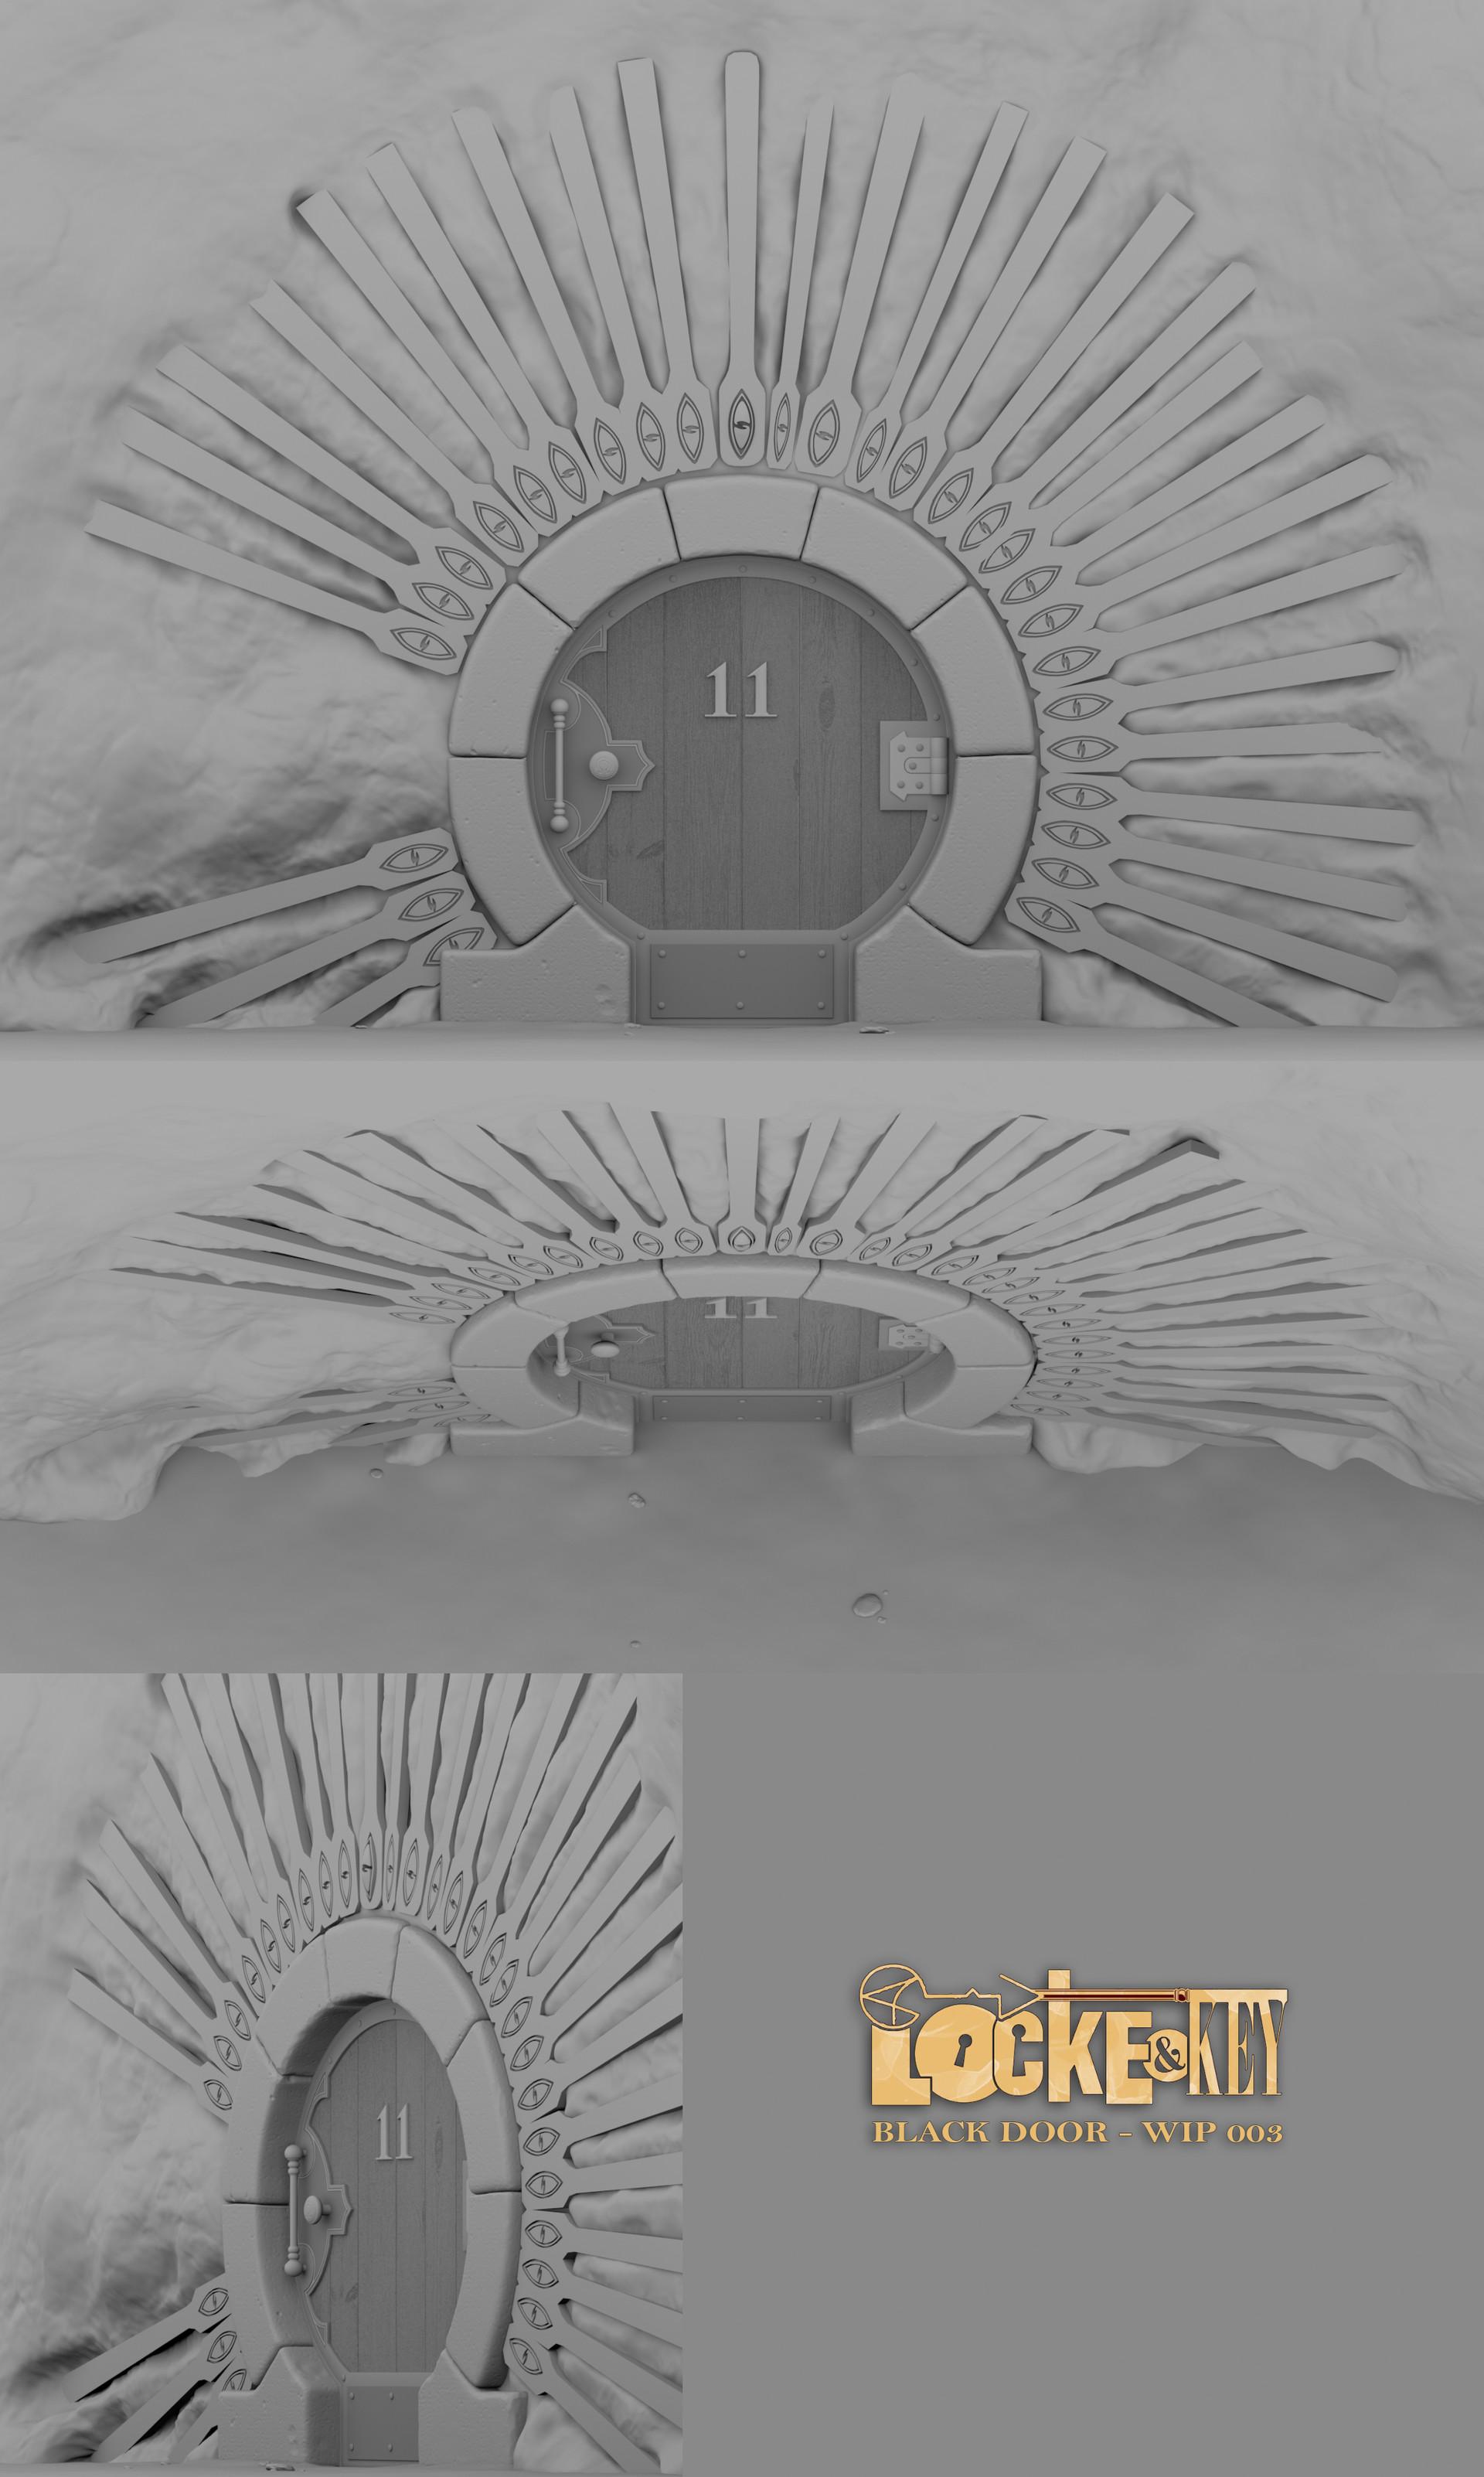 Samuel cote lrg lk black door wip004 & Samuel Côté - Locke u0026 Key - Omega Door